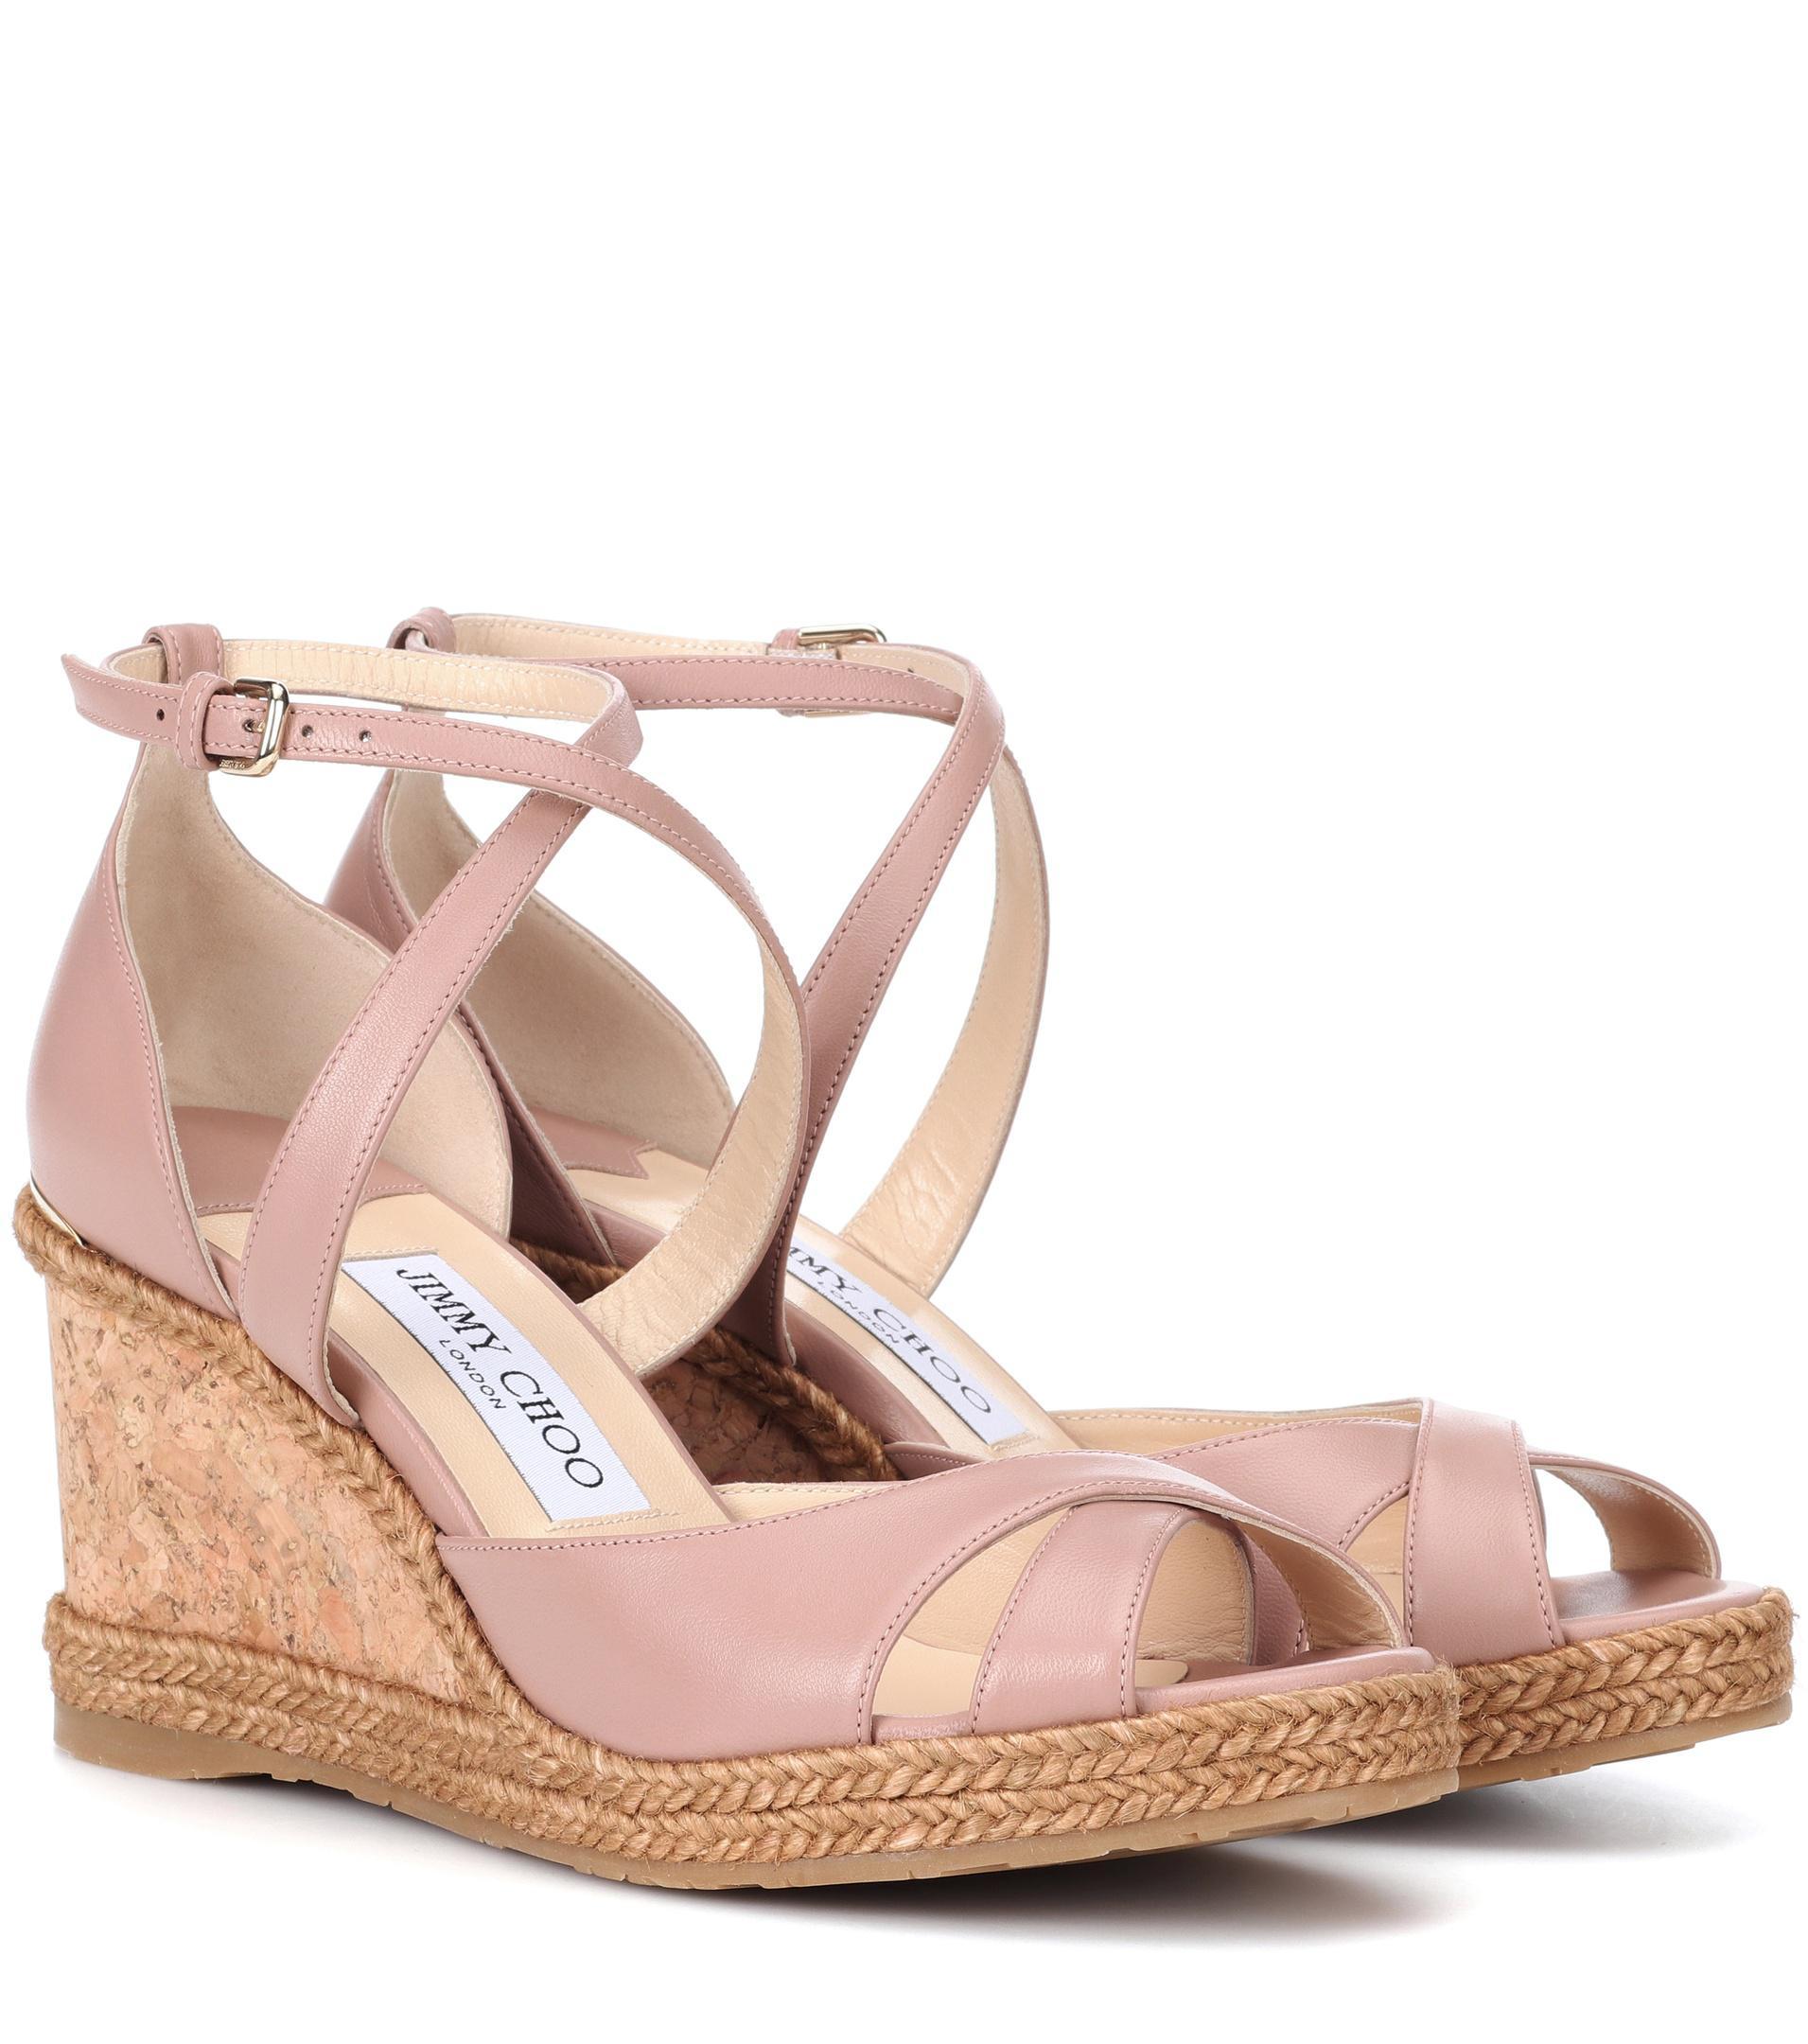 Alanah 80 leather wedge sandals Jimmy Choo London 2TMEI6